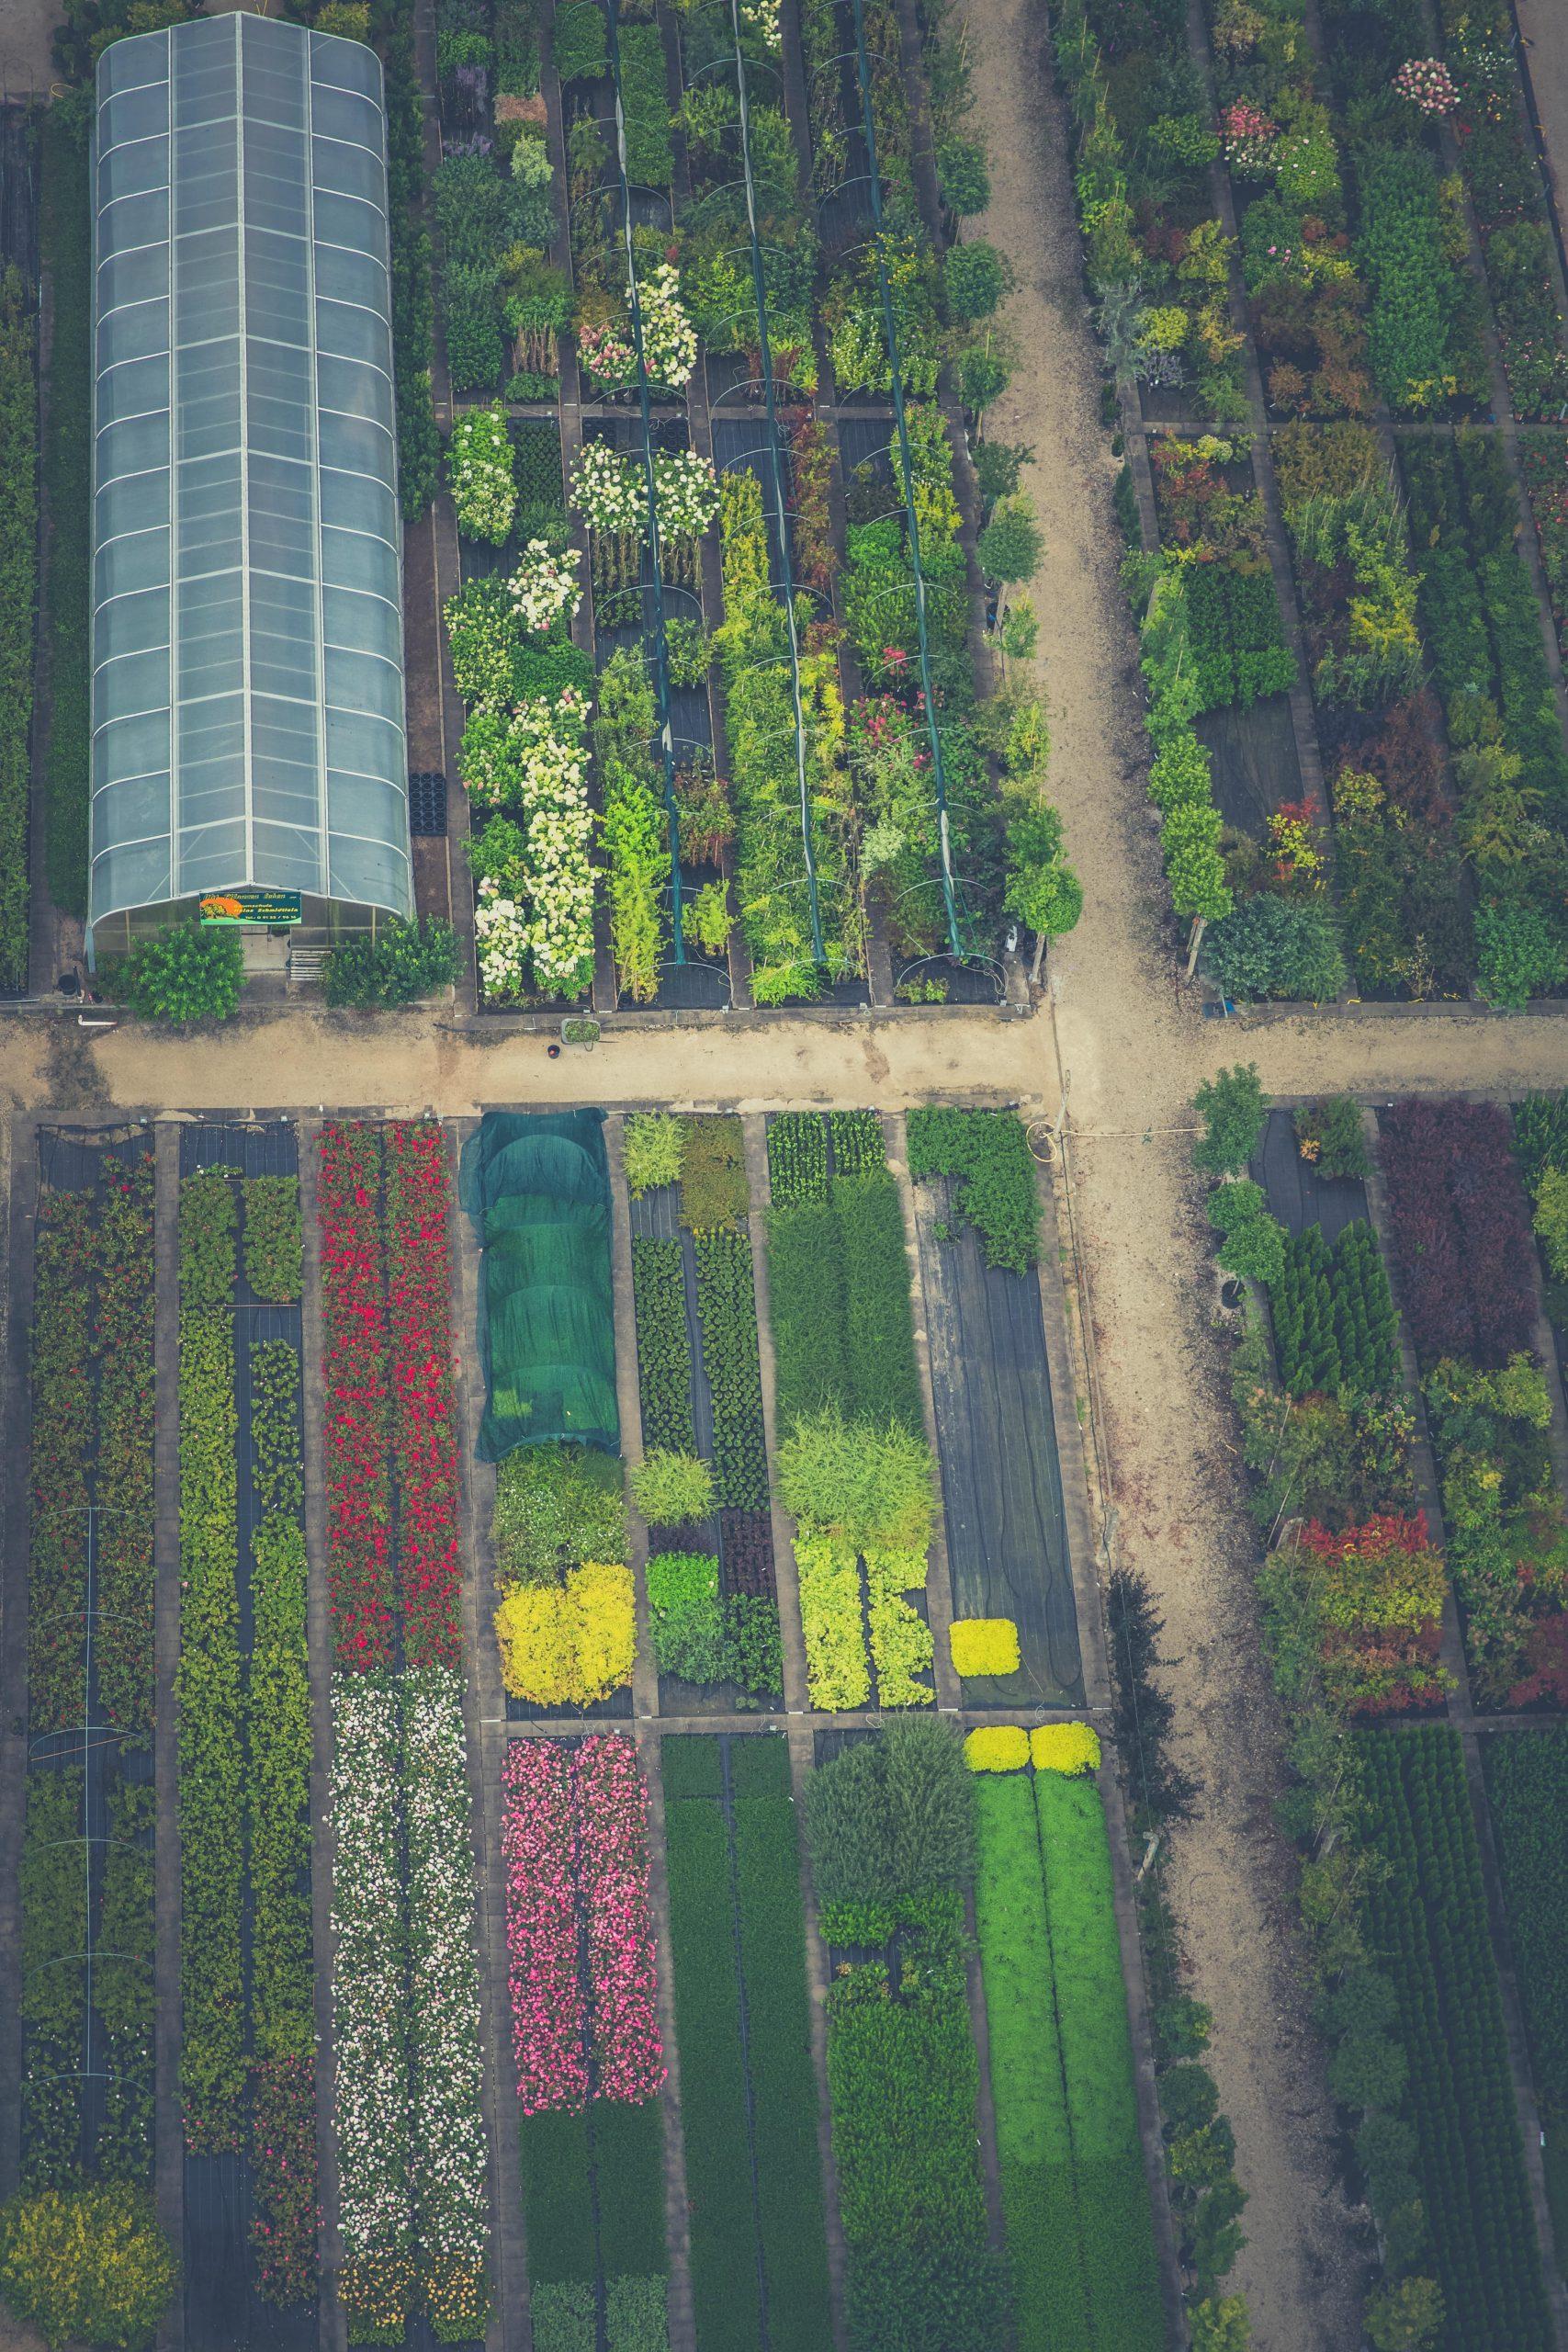 Production horticole ornementale france 2021